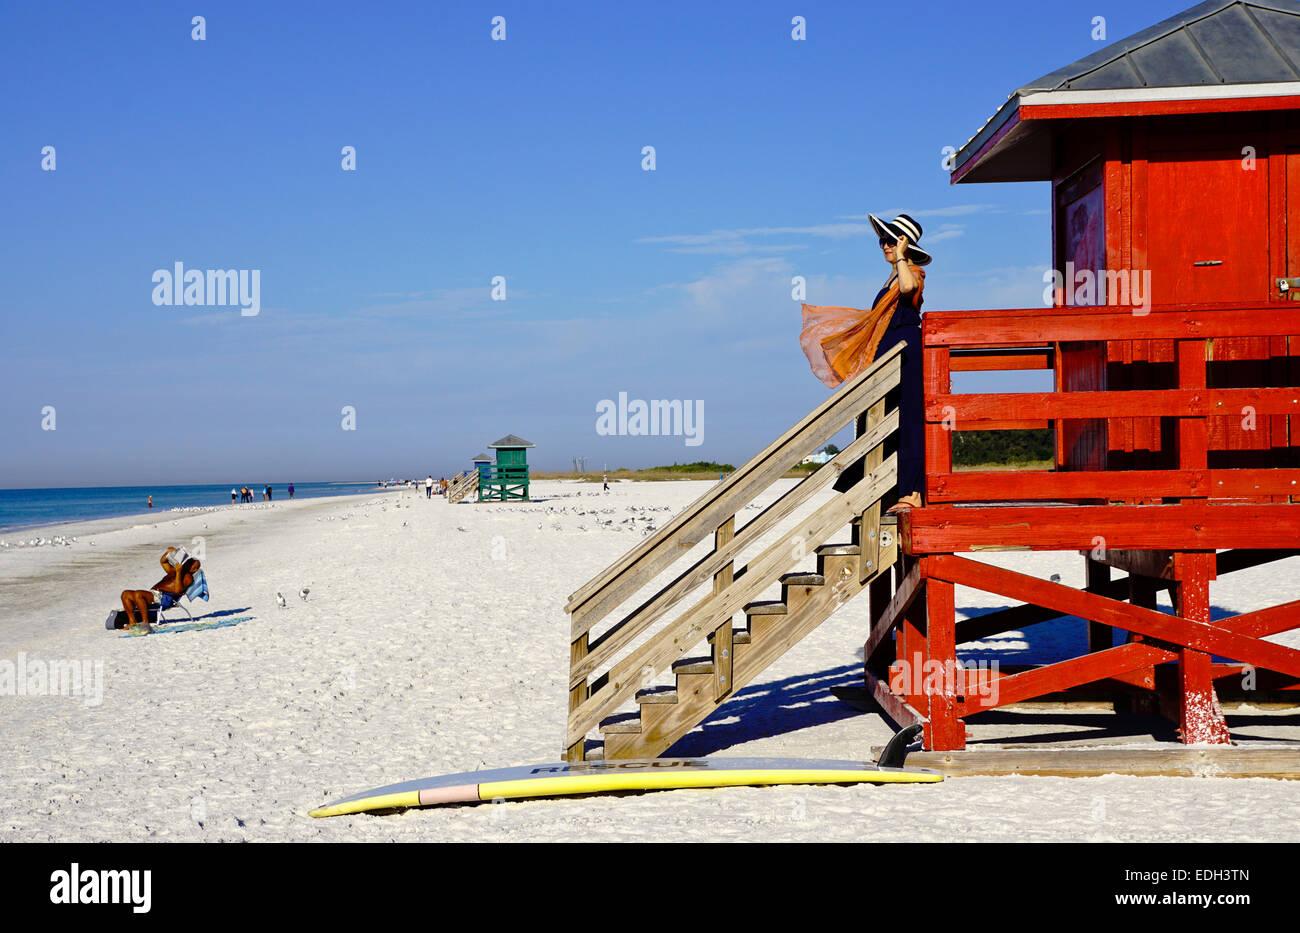 Siesta Key Beach lifeguard tower in Sarasota, Florida. - Stock Image